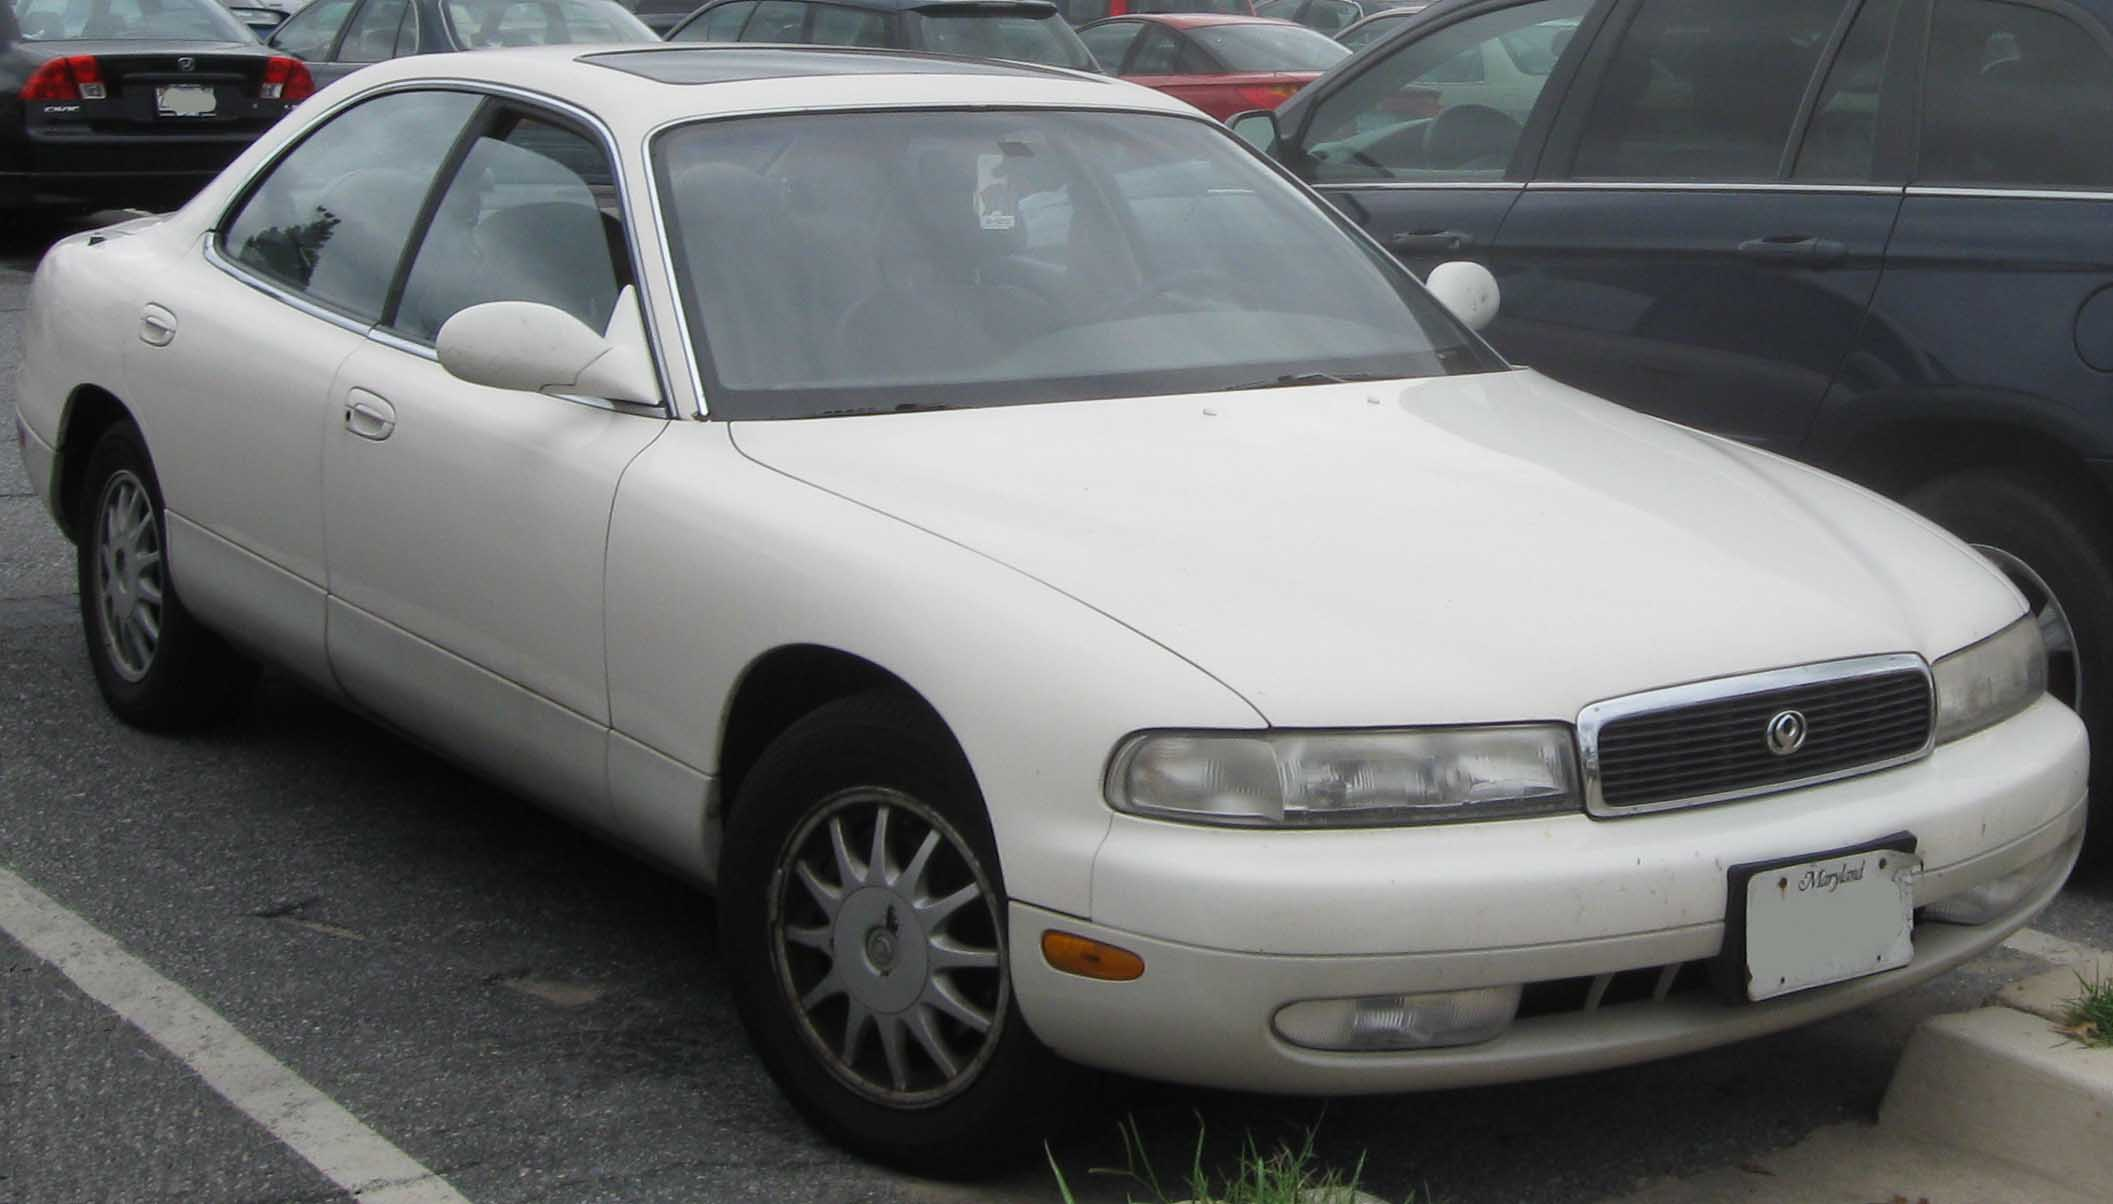 File:Mazda 929 .jpg - Wikipedia, the free encyclopedia